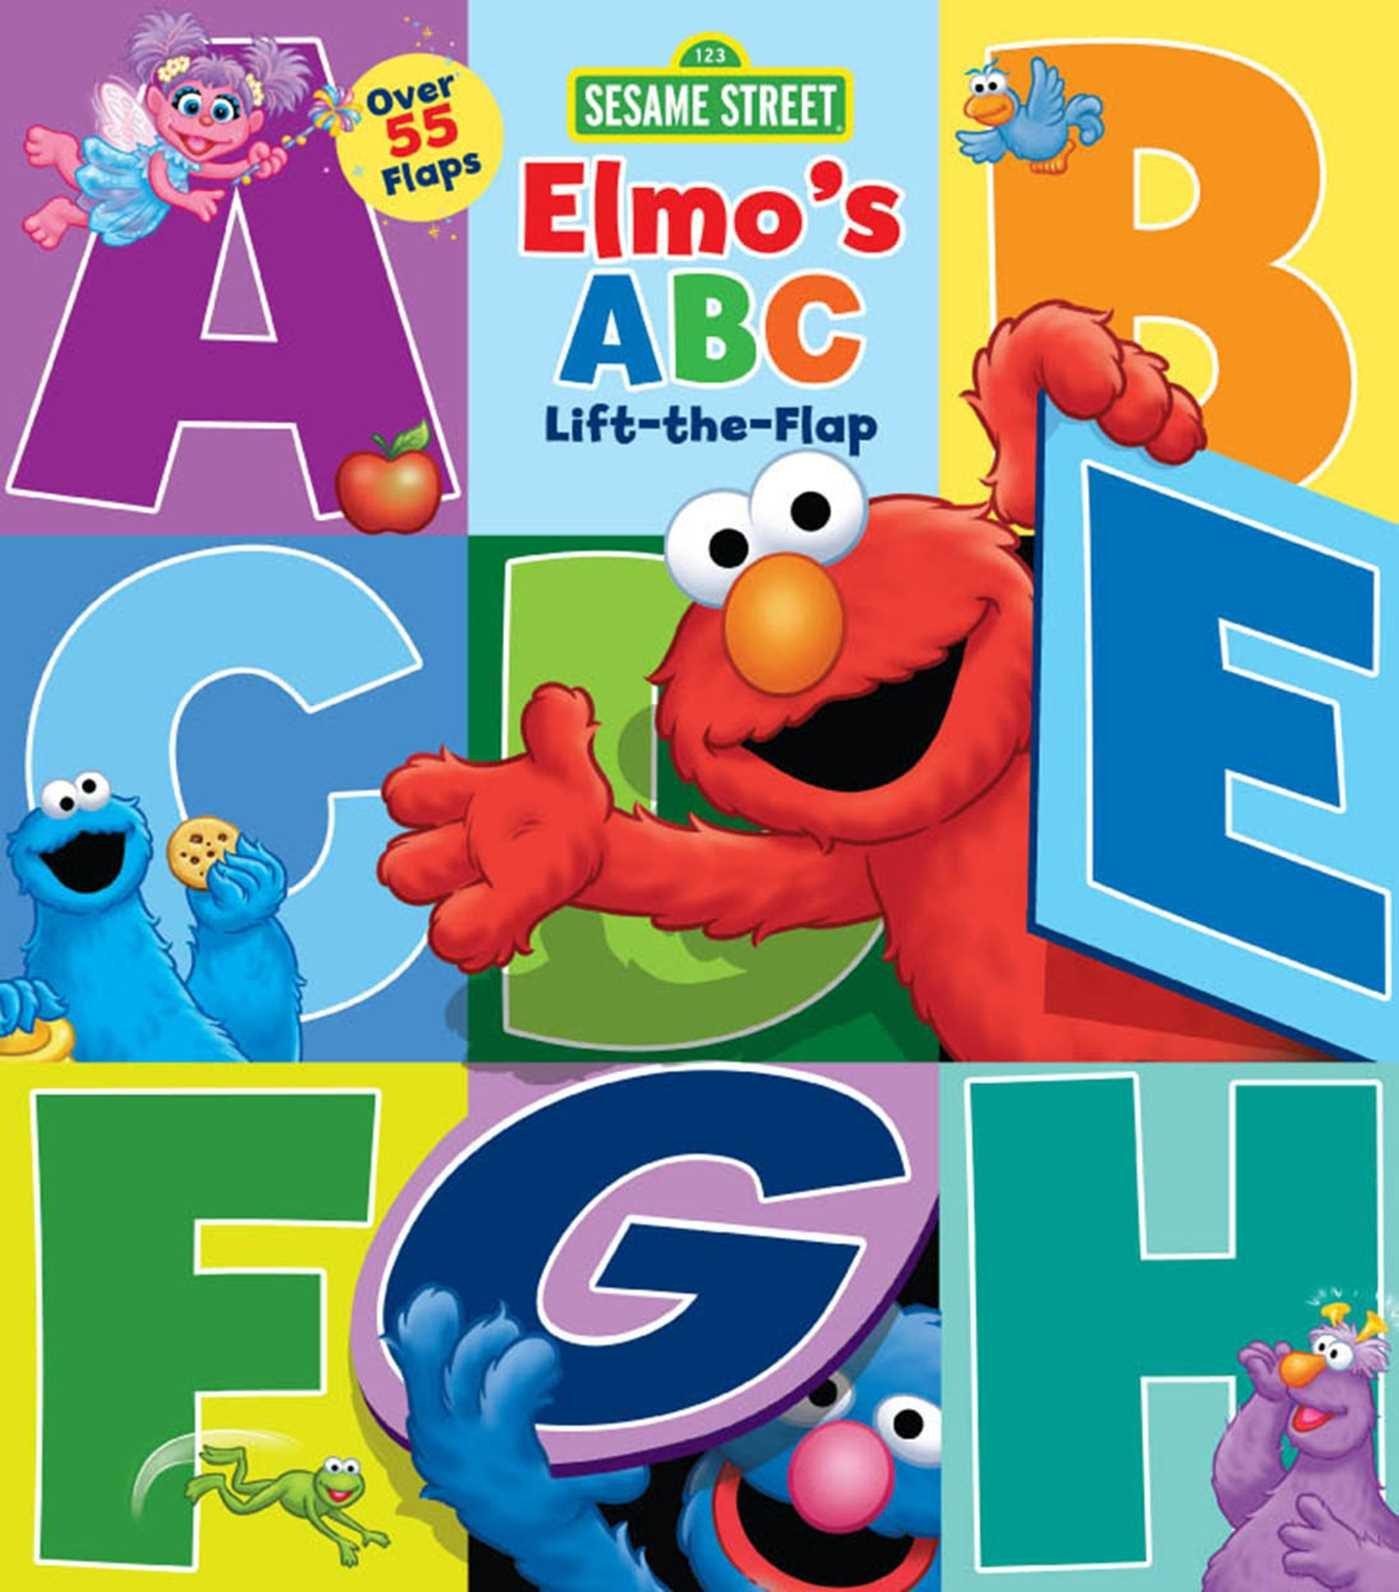 f23b858ffc Amazon.com: Sesame Street: Elmo's ABC Lift-the-Flap (9780794440589 ...